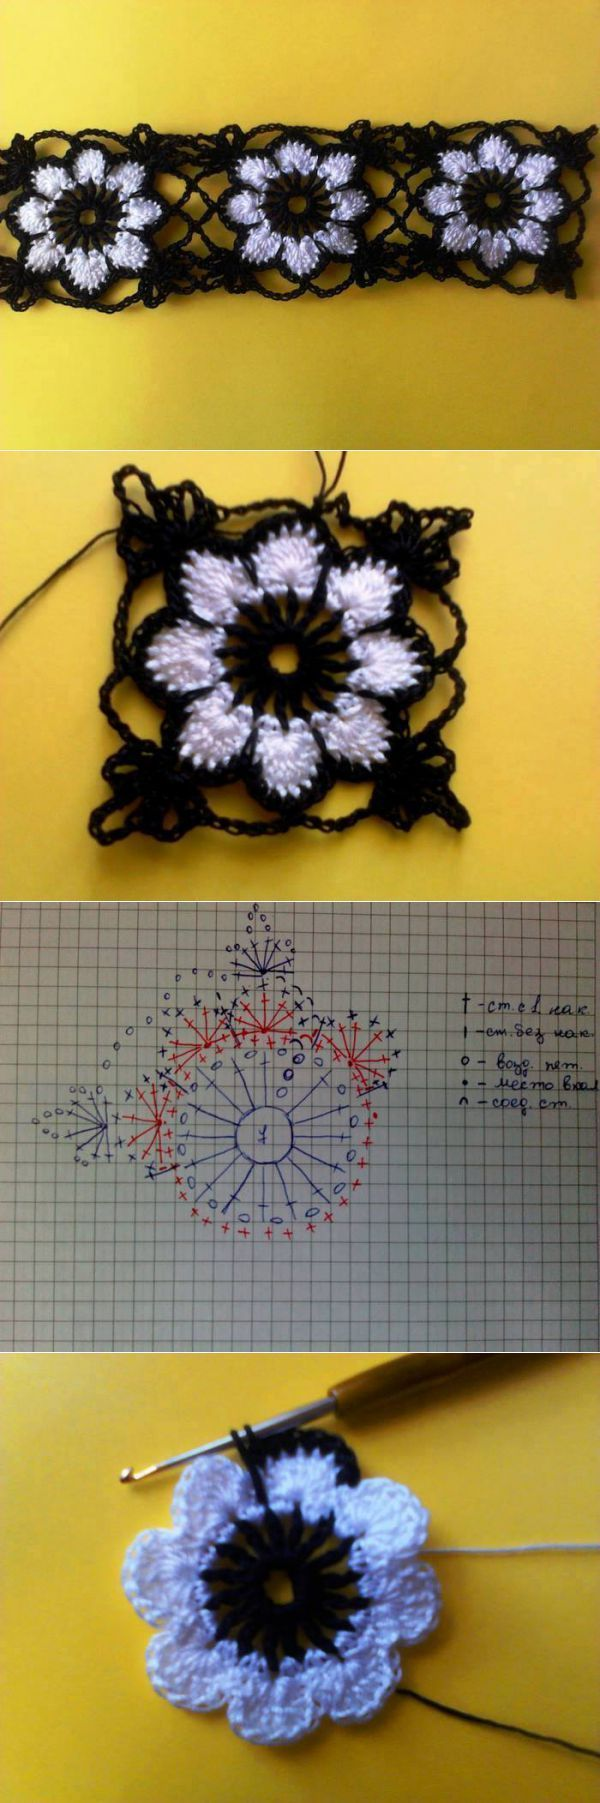 Pin By Lissah Dee On Knit And Crochet Pinterest Granny Flower Motif Motivos Hexagonales Squares